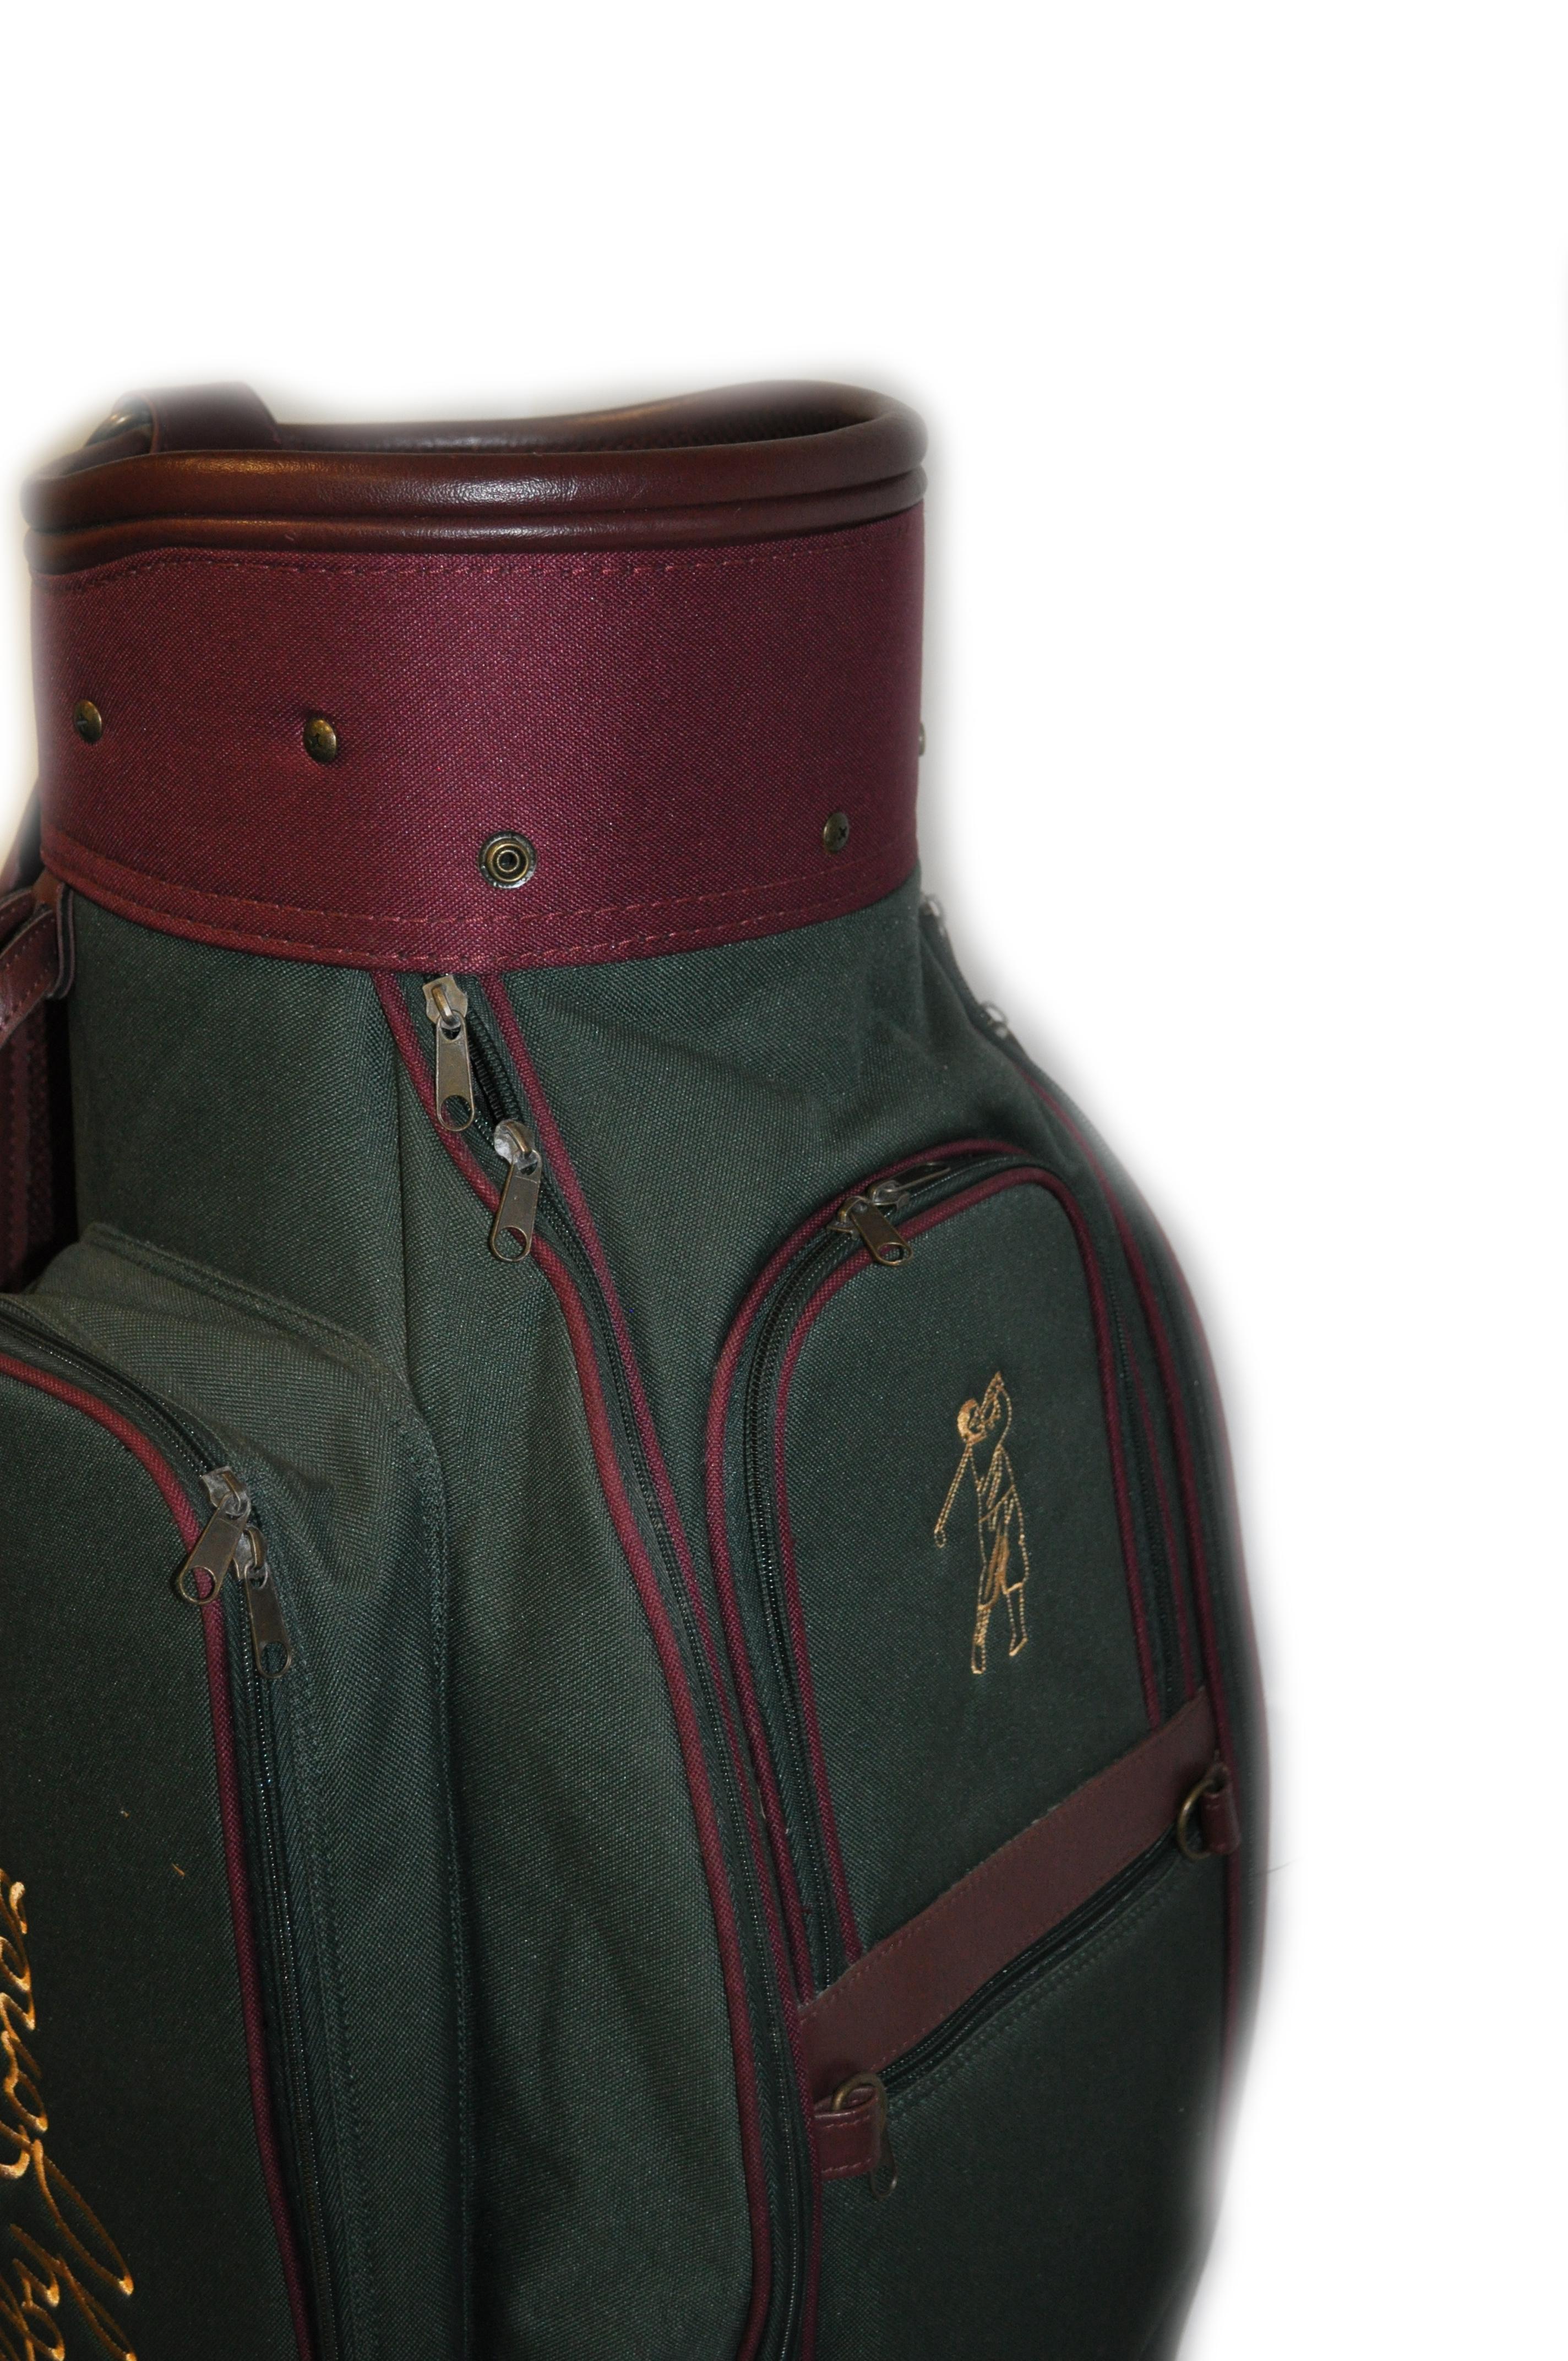 "GOLF BAG ""BOBBY JONES"" Cart Bag £75.00 - GG356   Hickory ..."